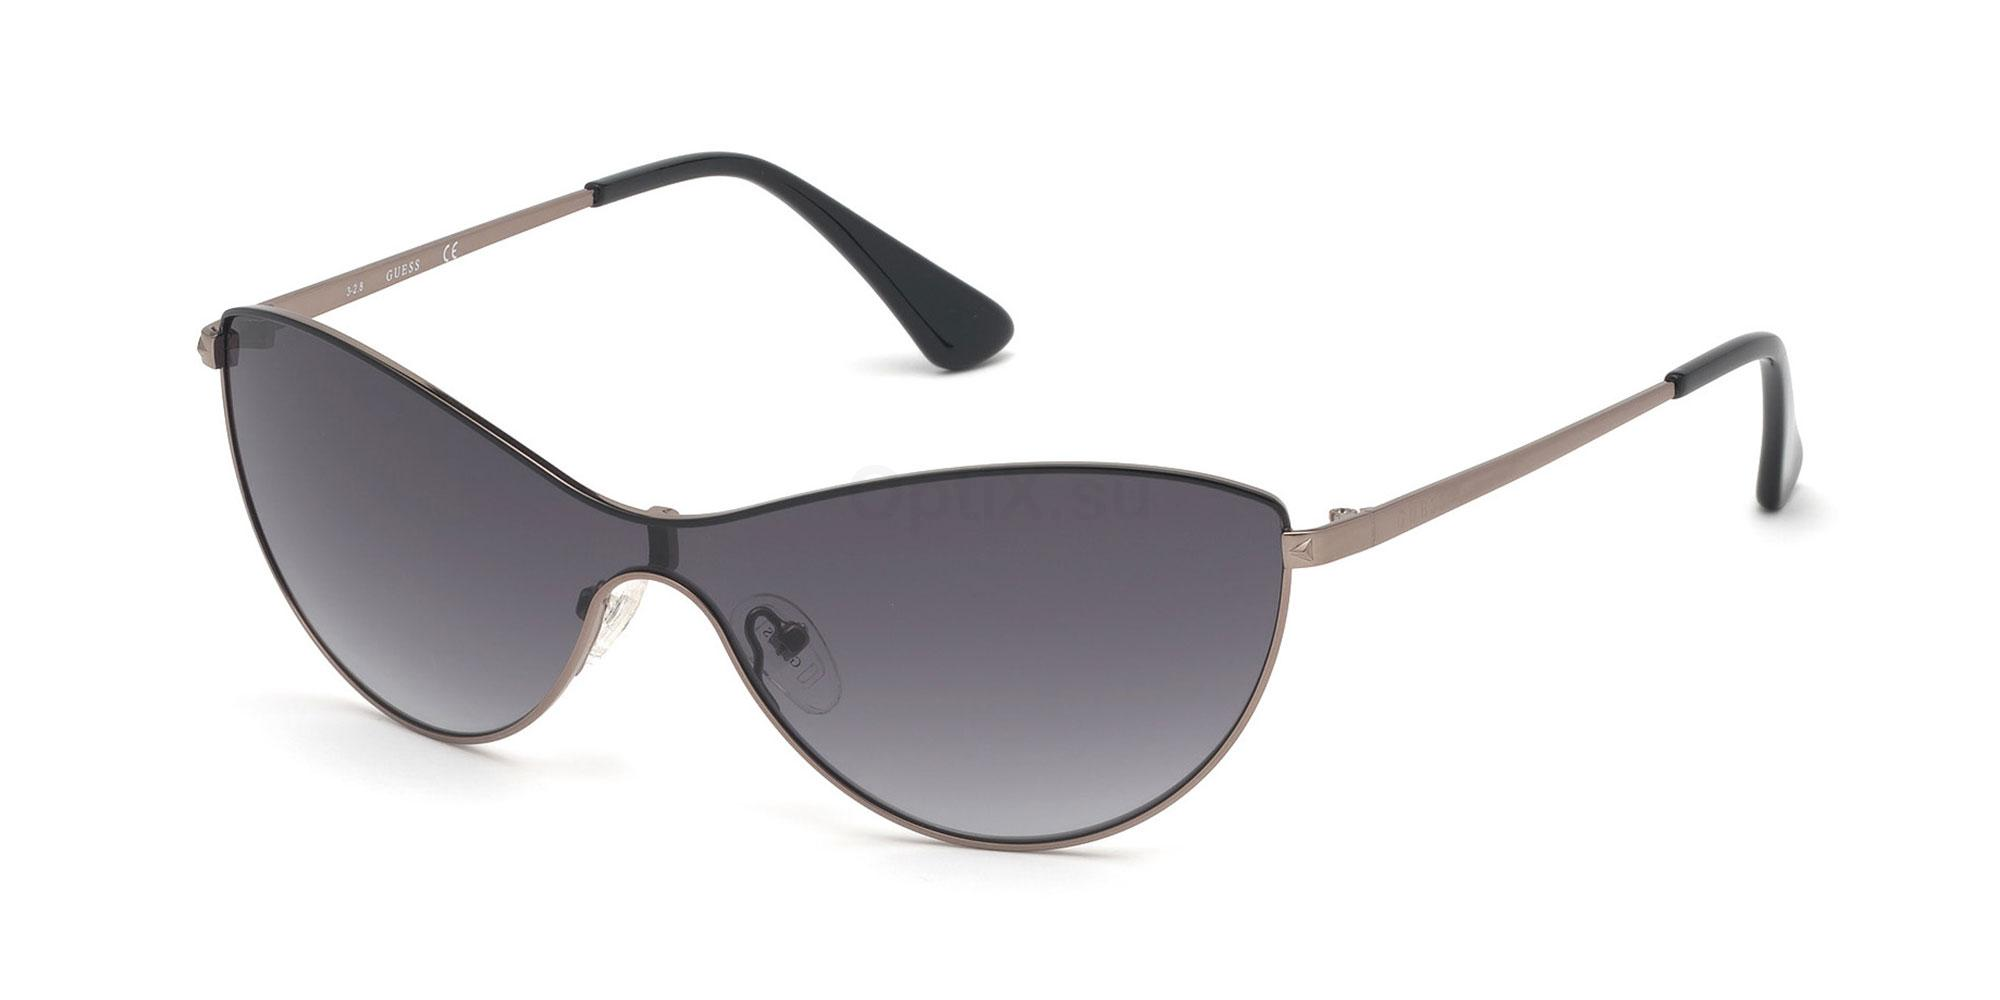 05B GU7630 Sunglasses, Guess